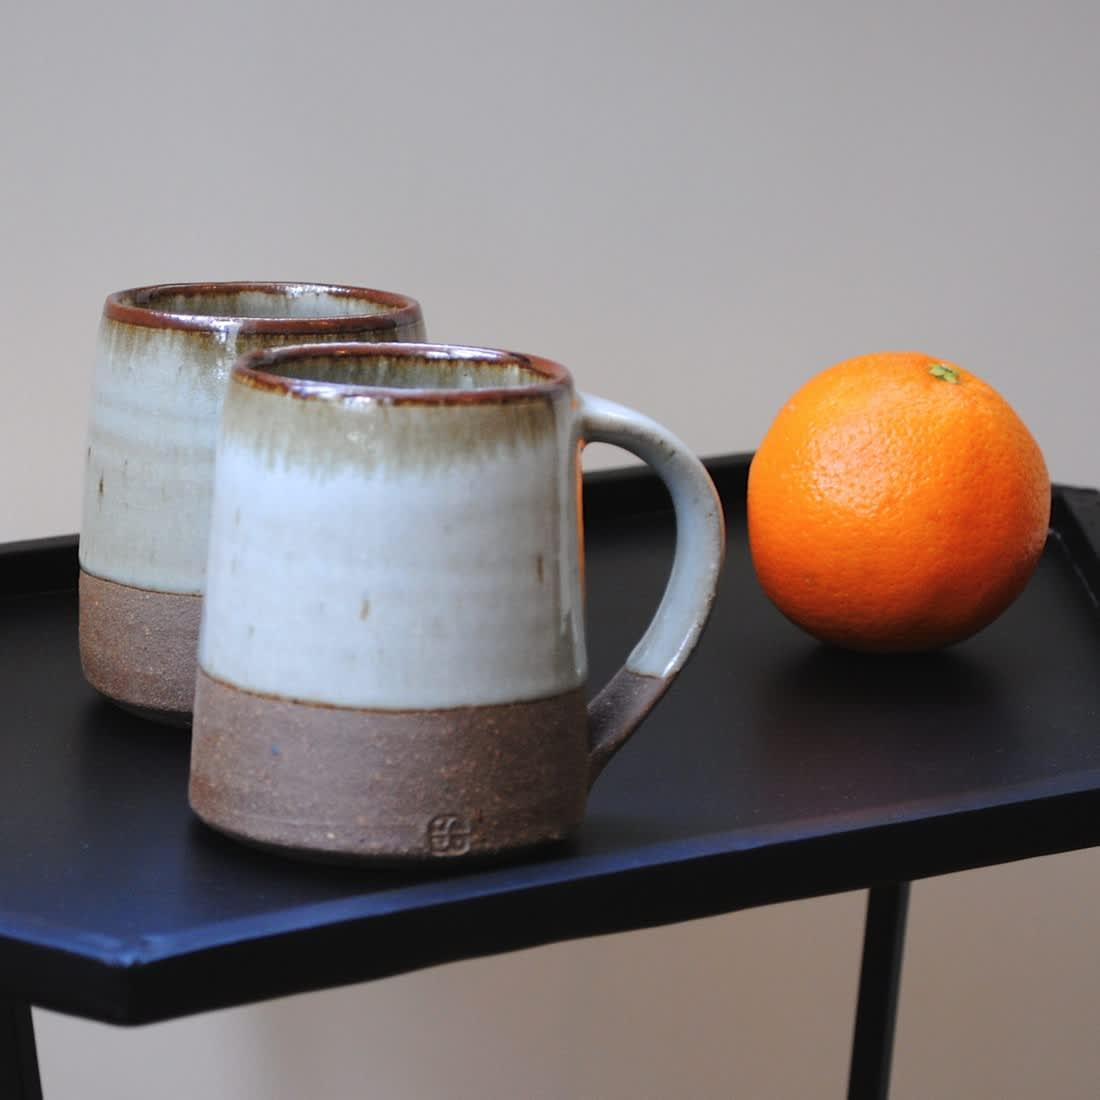 Leach Pottery Large Mug - Dolomite